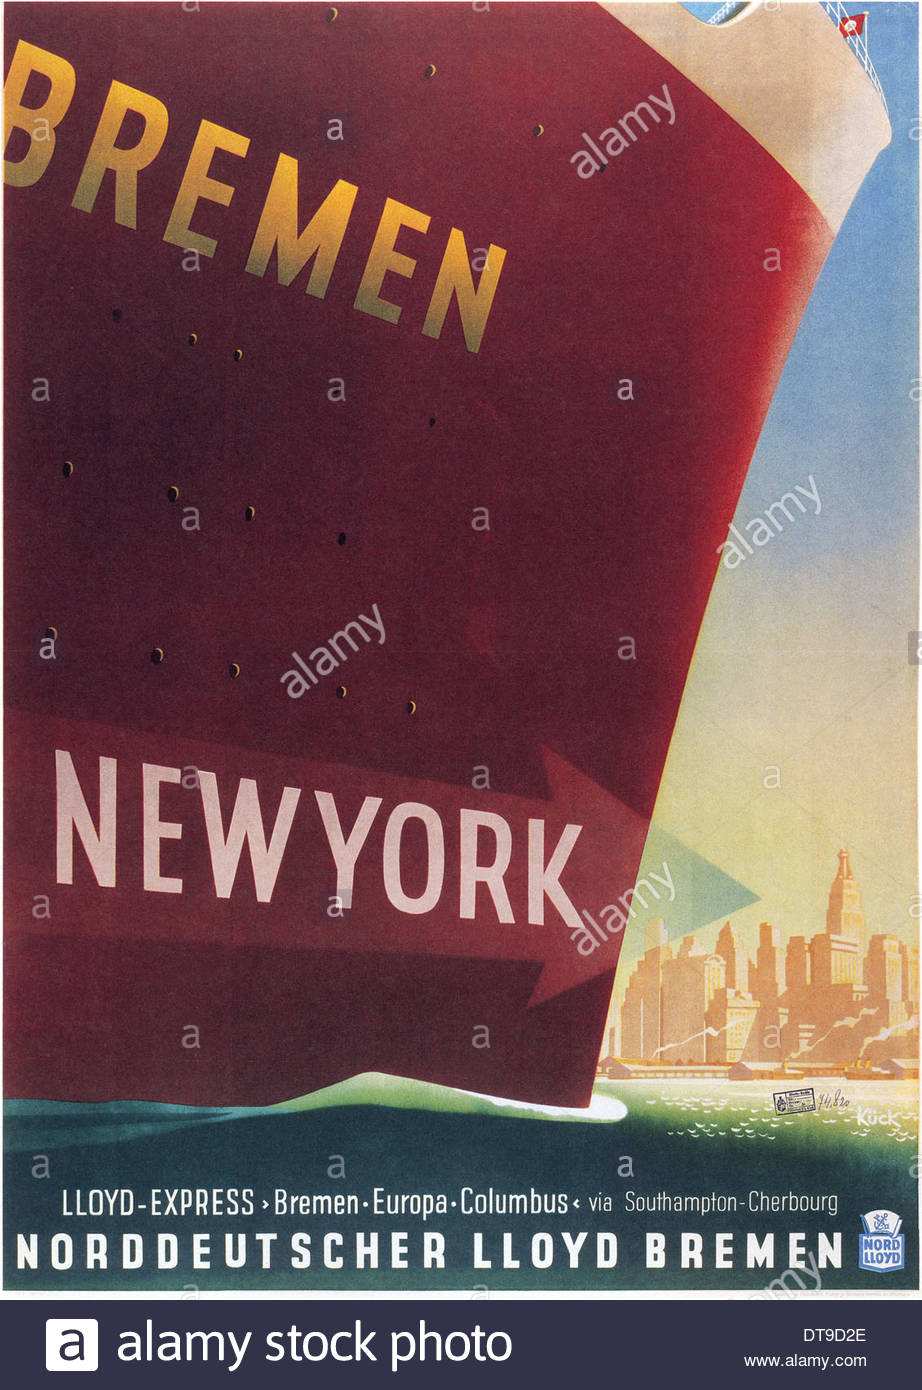 Bremen New York. Lloyd Express Line, 1937. Artist: Kück, Fritz (1893-1974) - Stock Image